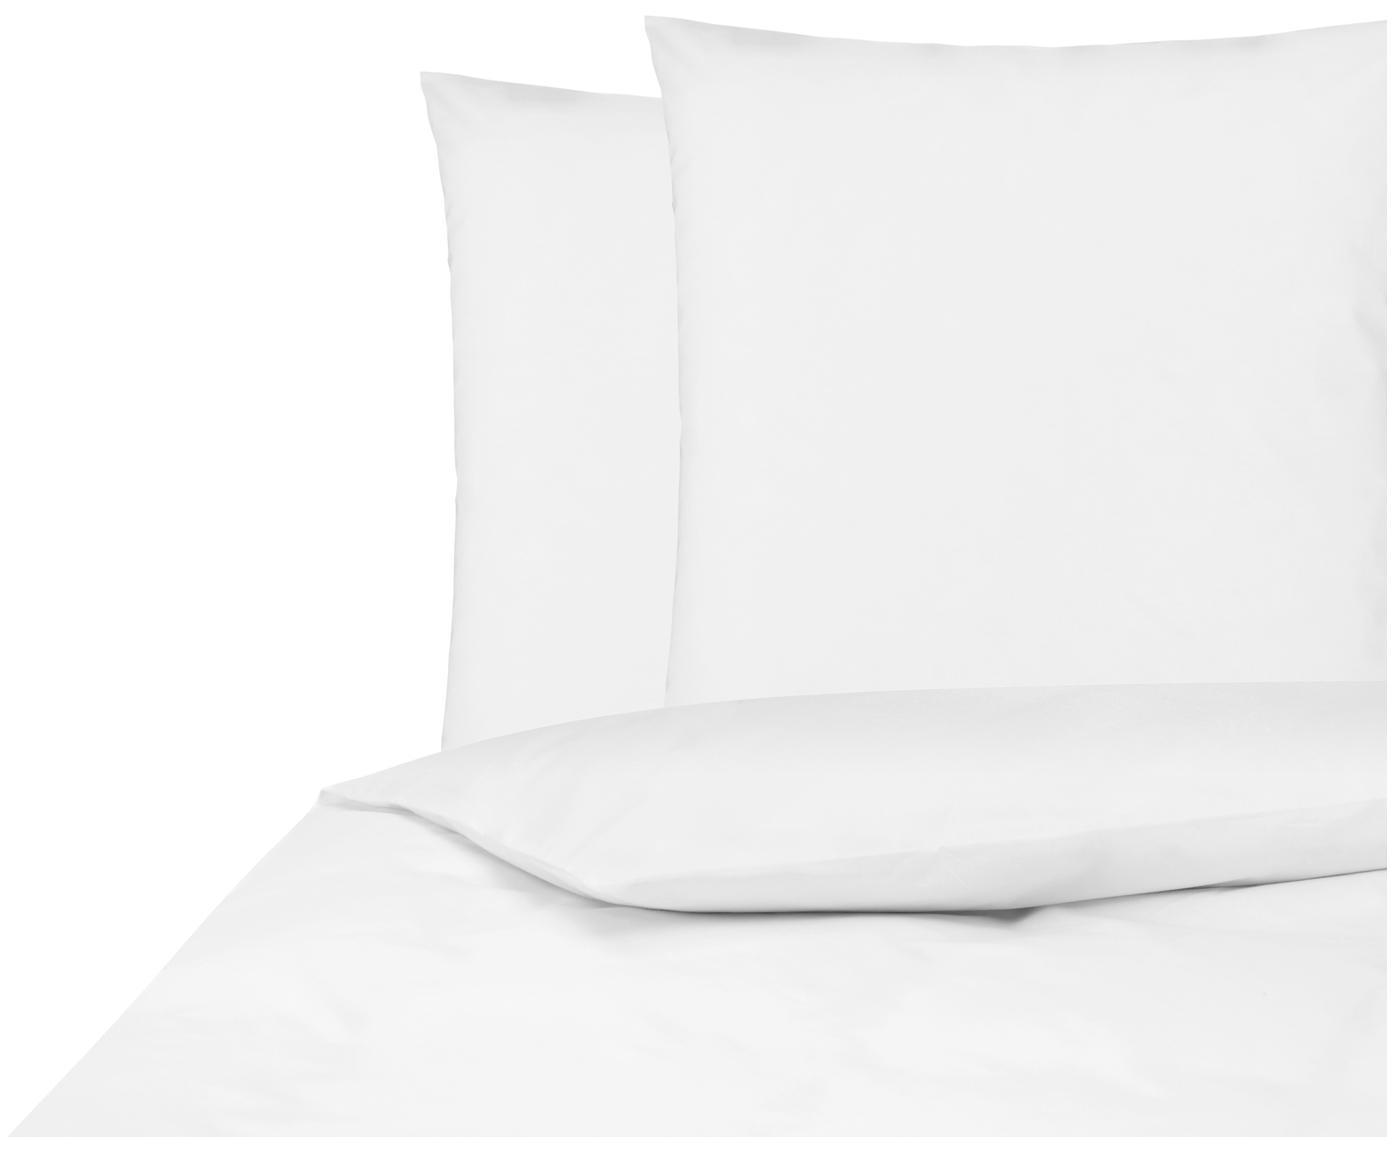 Baumwollperkal-Bettwäsche Elsie in Weiß, Webart: Perkal Fadendichte 200 TC, Weiß, 200 x 200 cm + 2 Kissen 80 x 80 cm